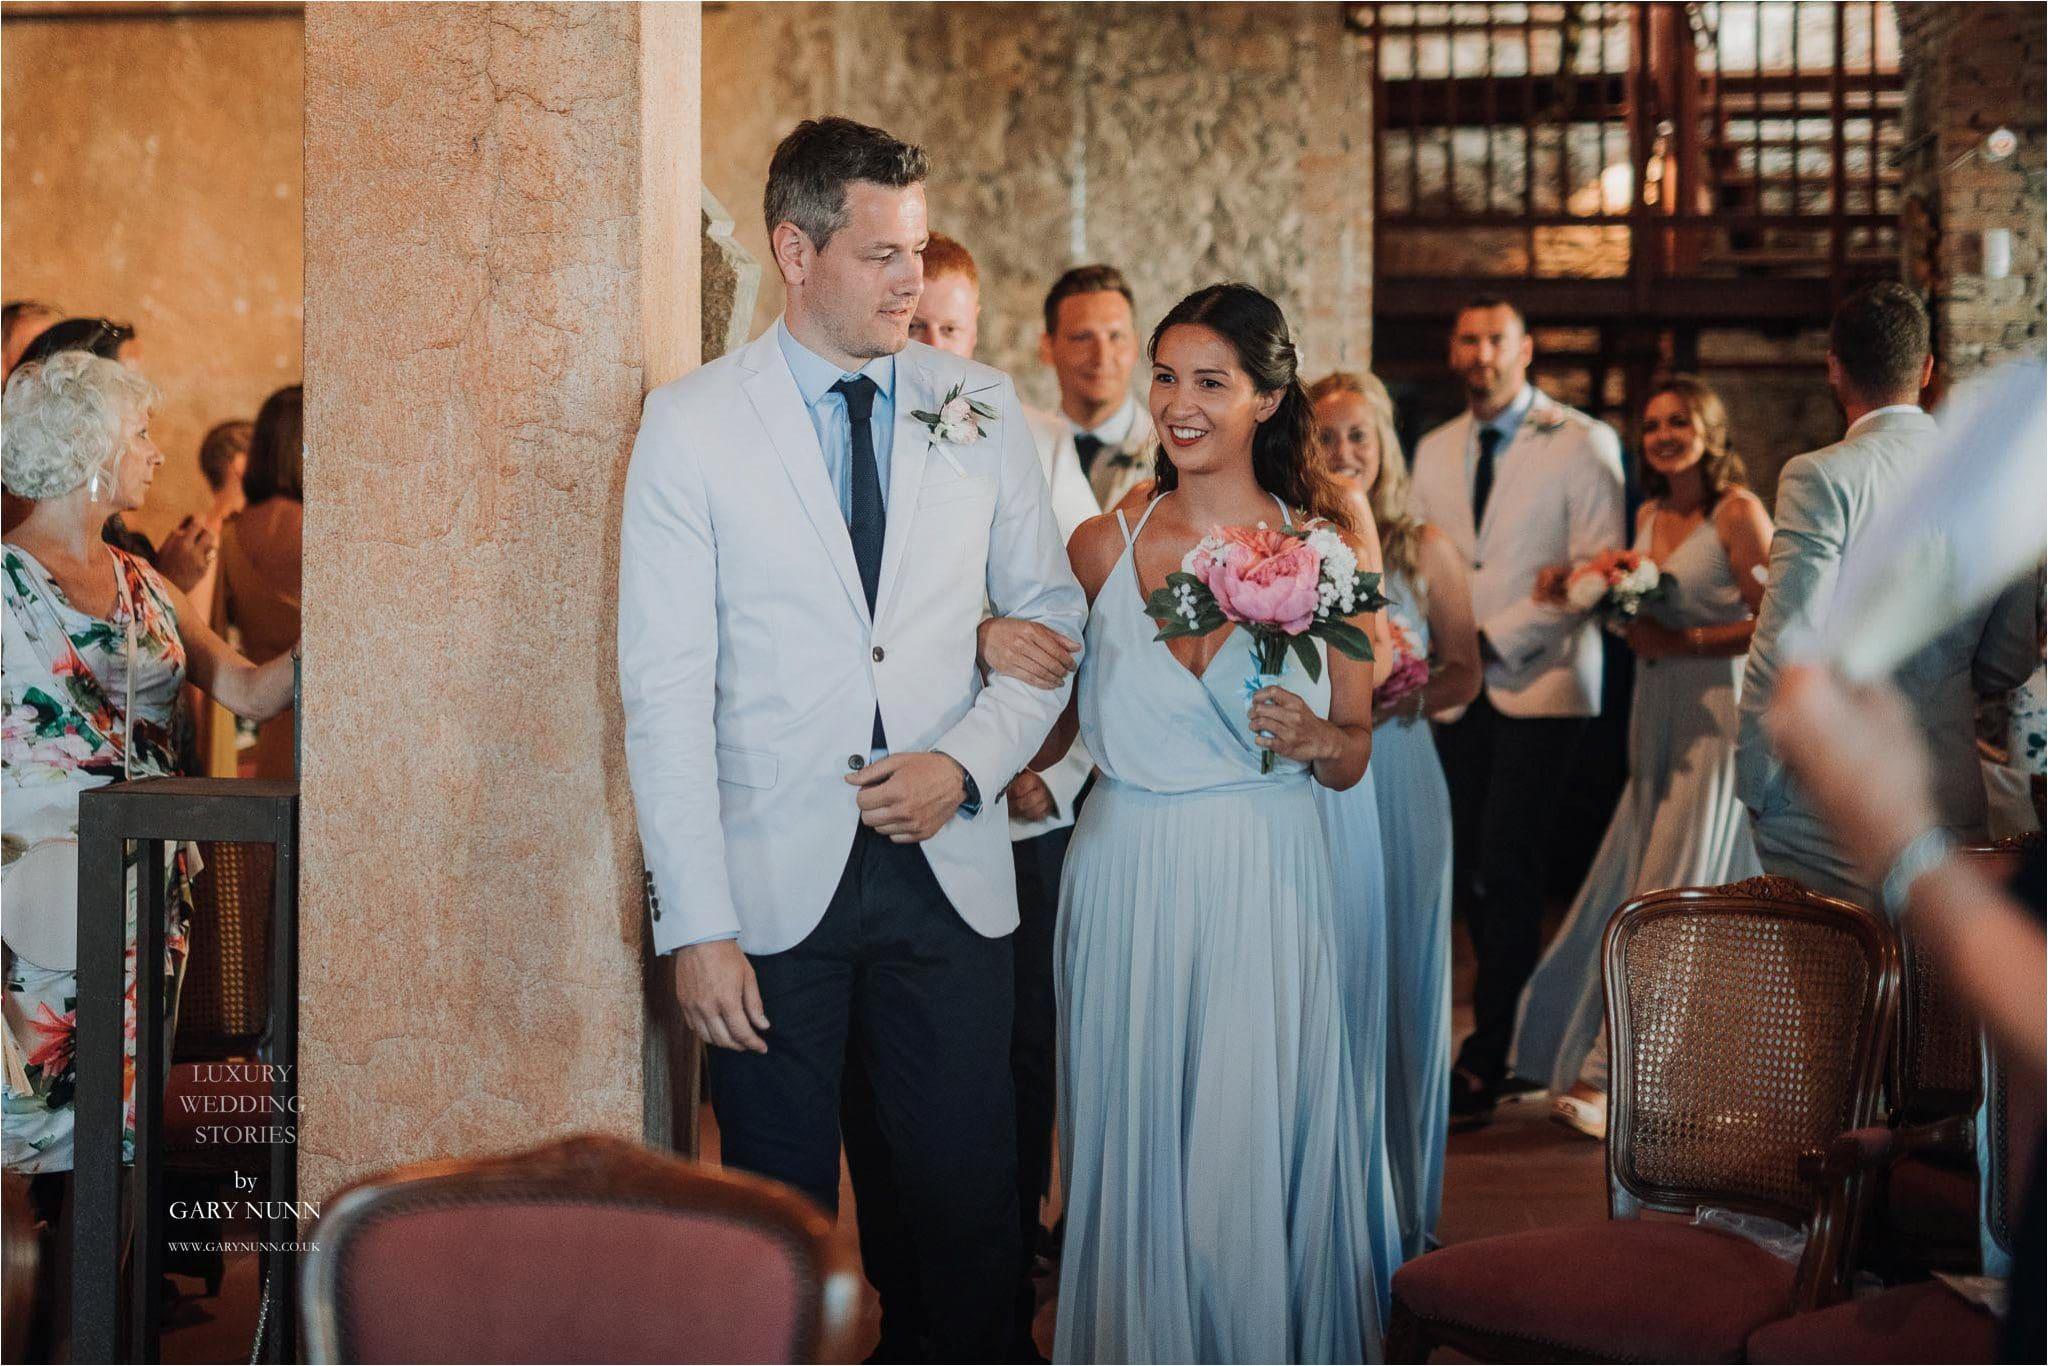 belmond grand hotel timeo, destination wedding photographer italy, Gary Nunn Photography, grand hotel timeo, mount etna, sicily, sicily wedding photography, top 10 wedding photographers, wedding photograpgher leighton buzzard, weddings in Taormina